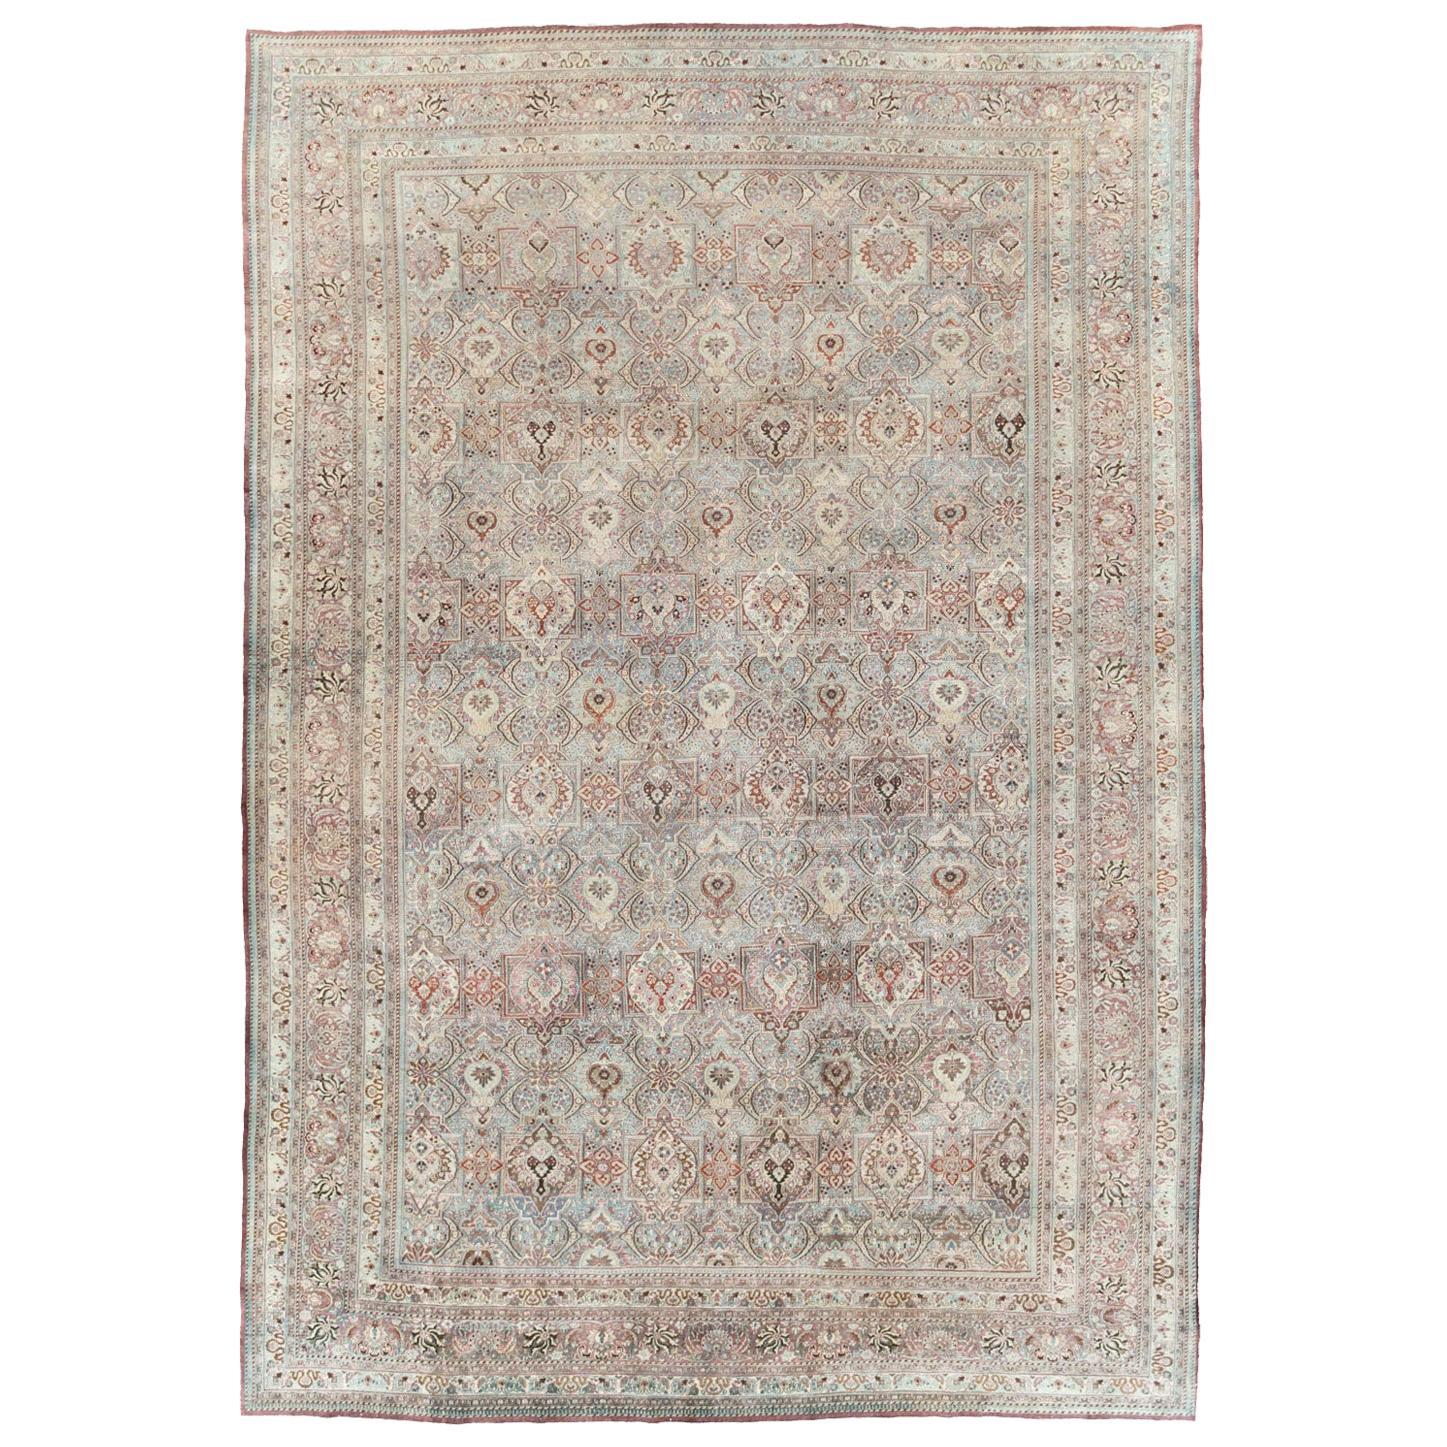 Early 20th Century Handmade Persian Mashad Large Room Size Carpet